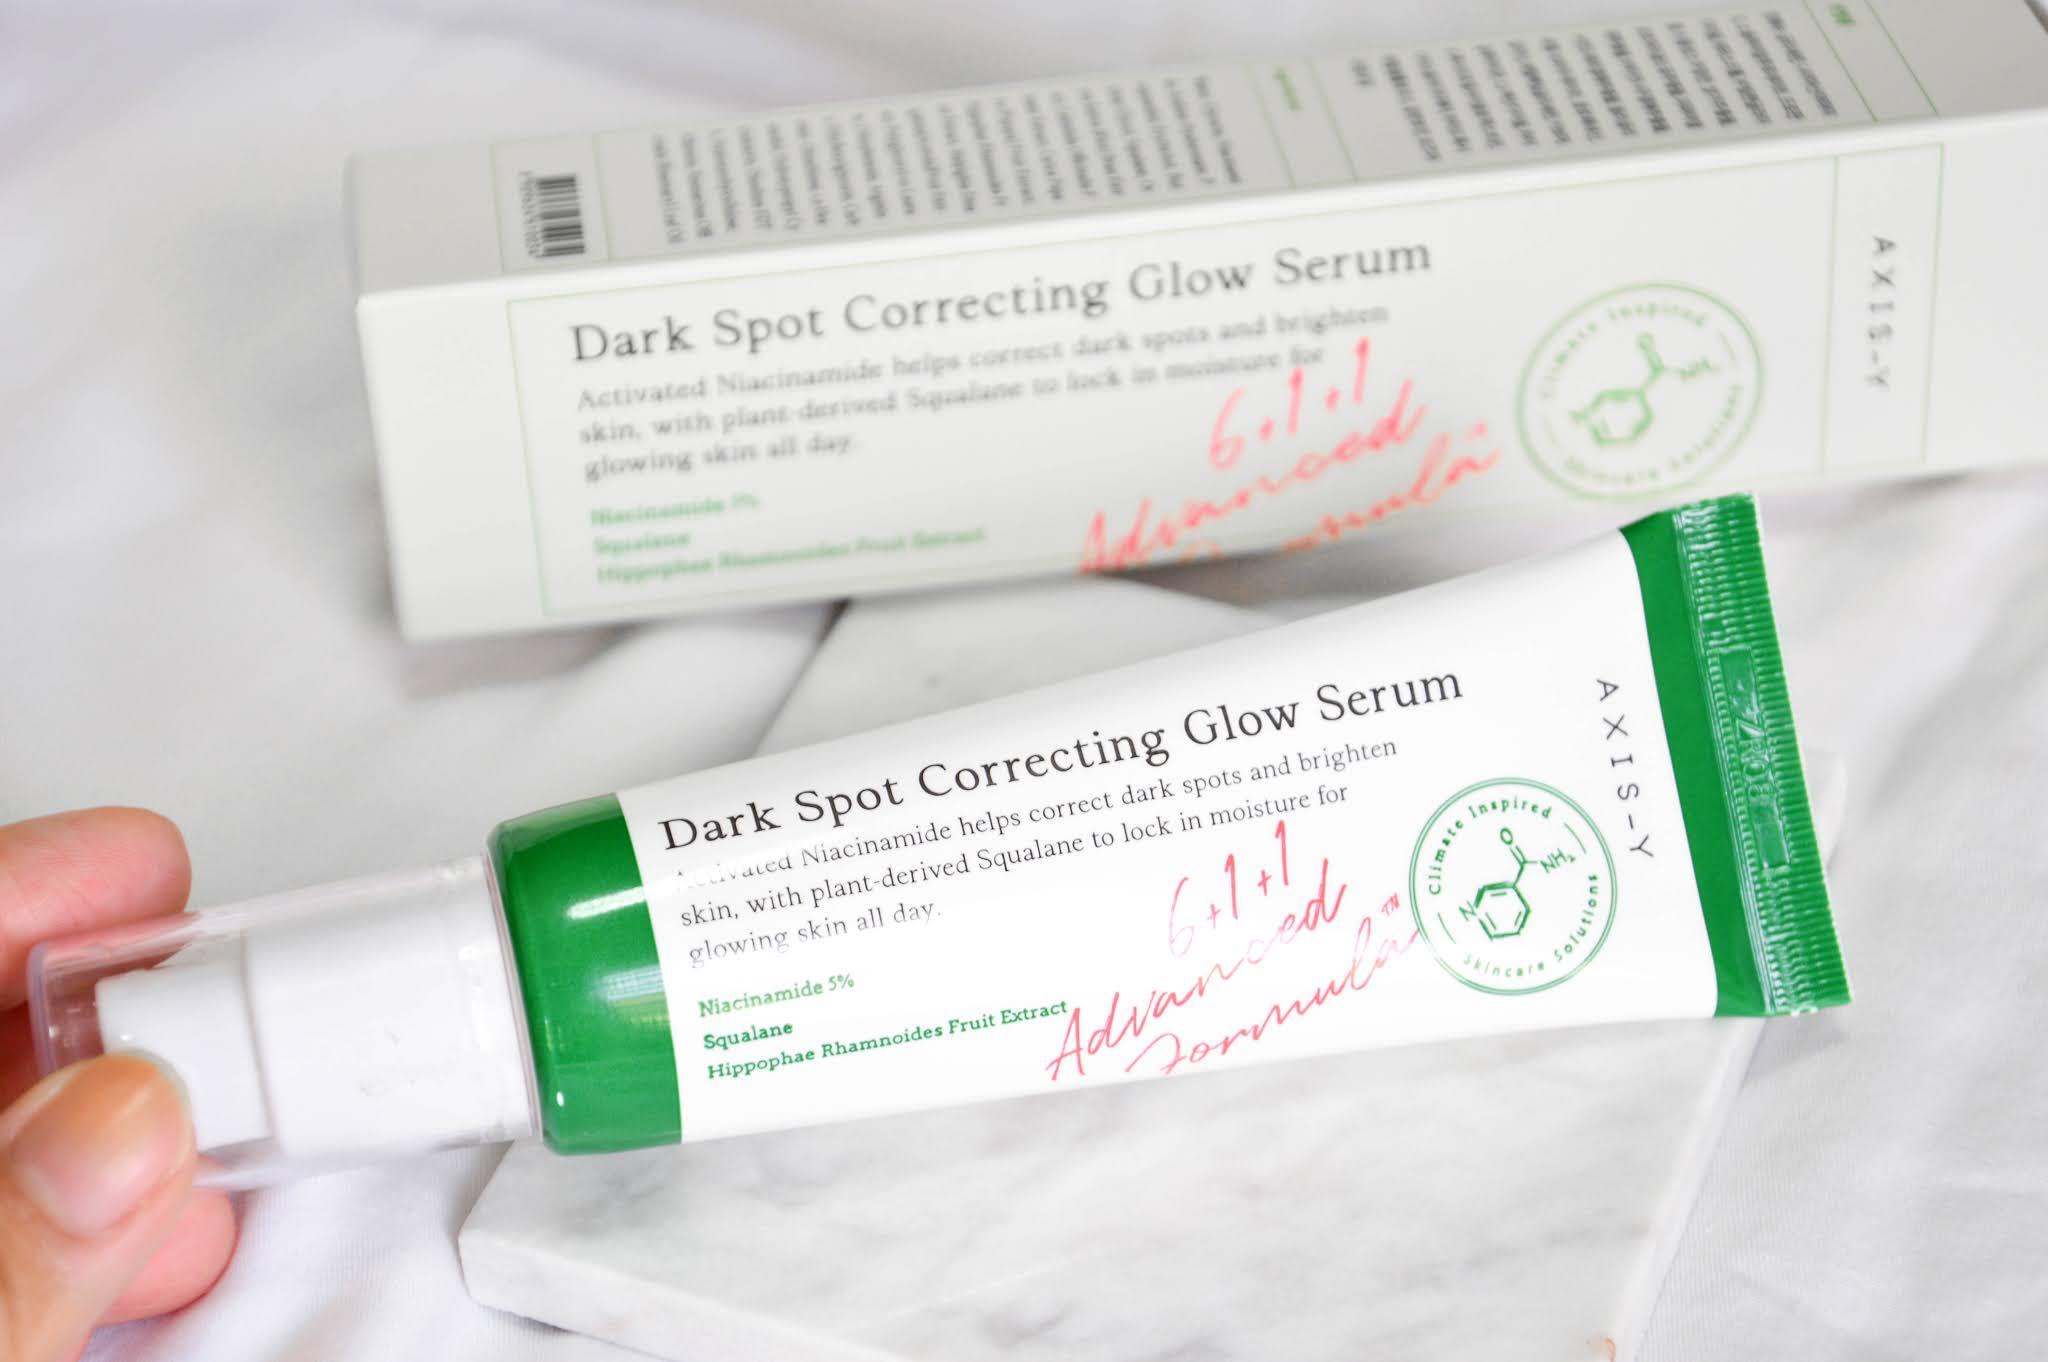 AXIS-Y Dark Spot Correcting Glow Serum Review